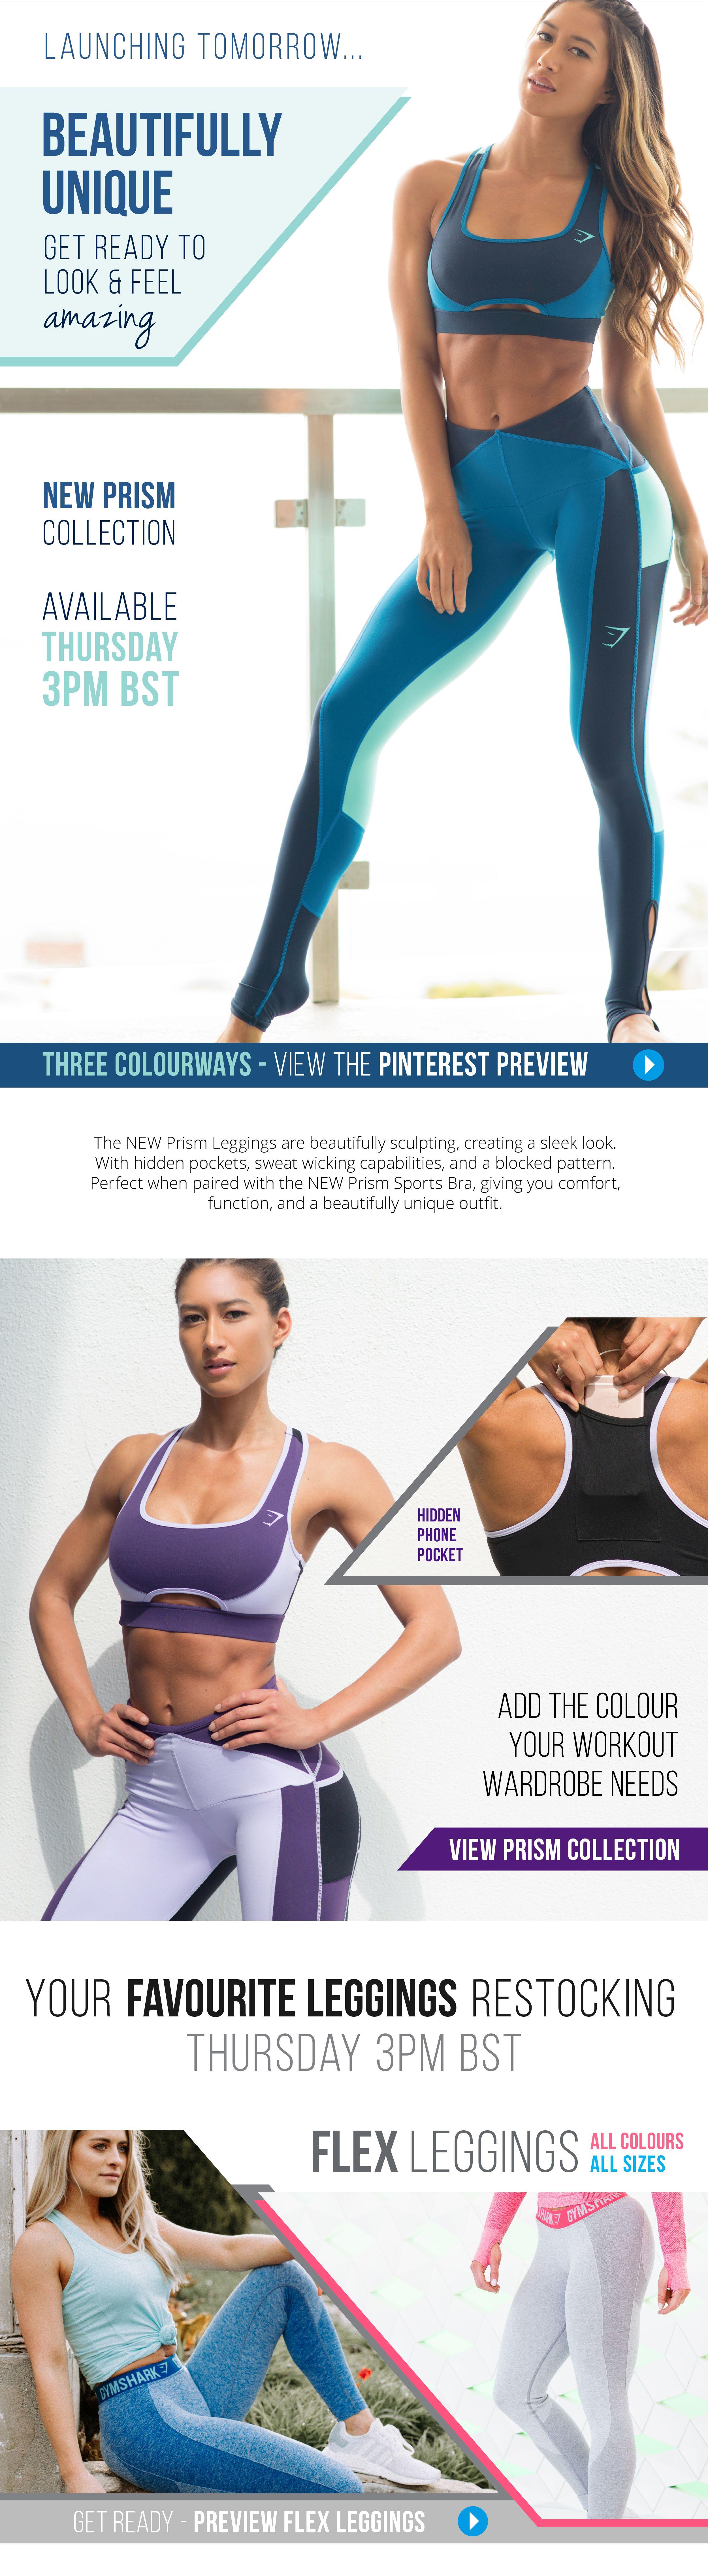 Pin by Rebecca Shipley on Portfolio | Flex leggings, Print ...